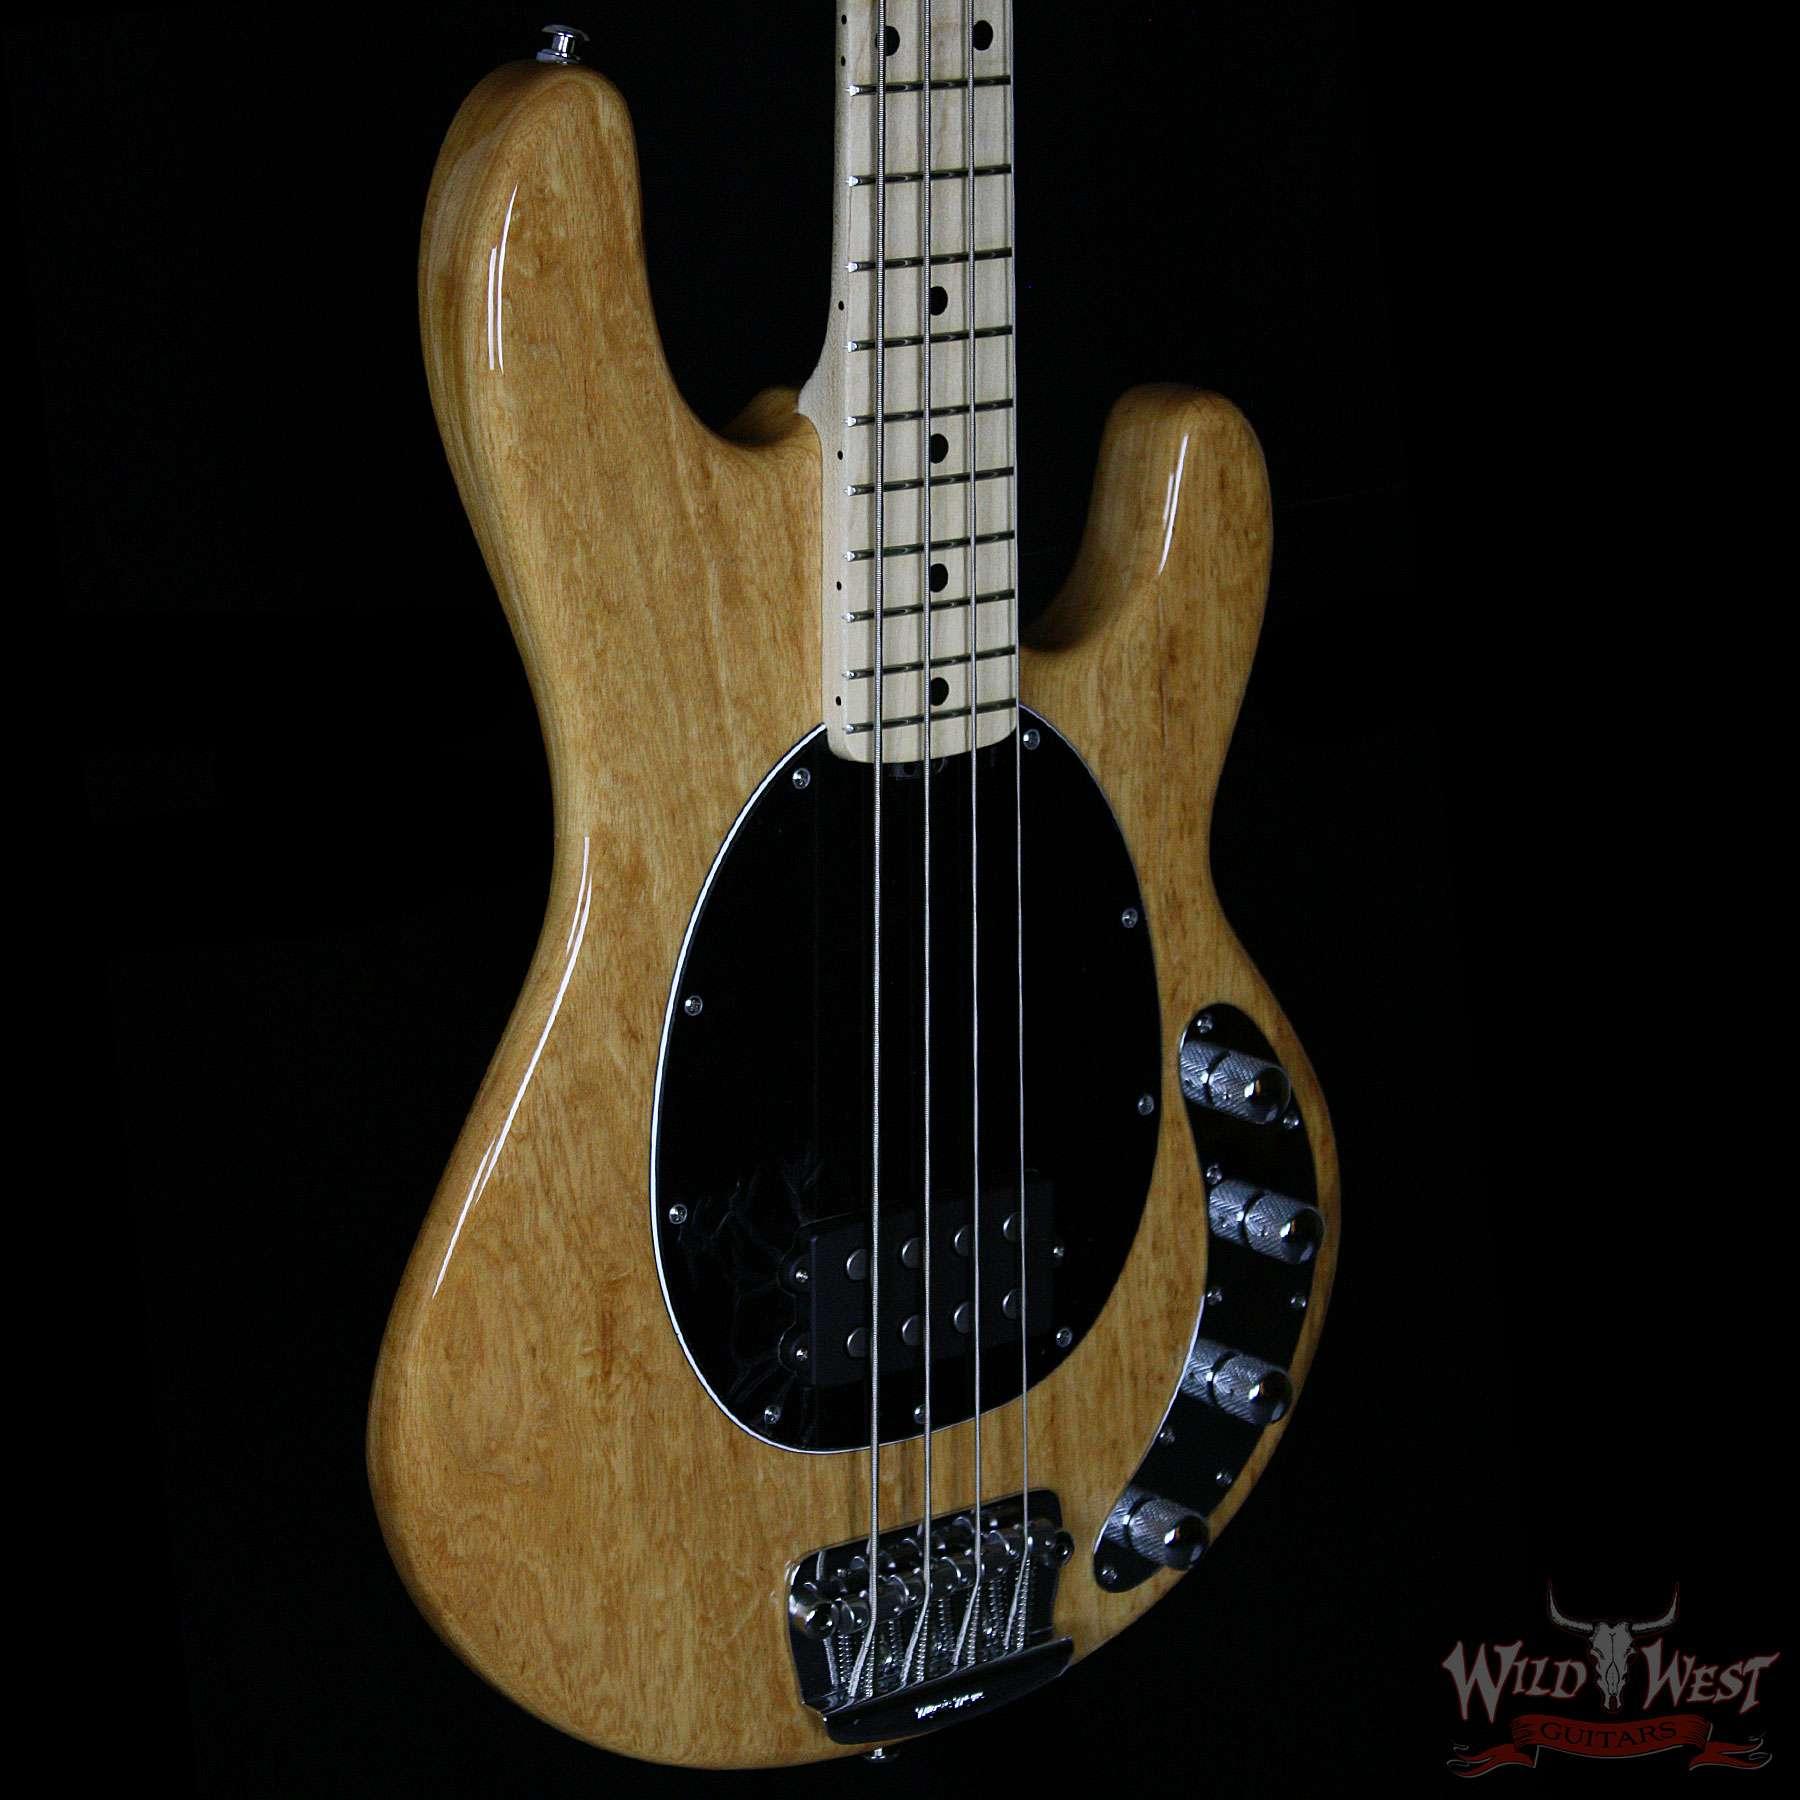 ernie ball music man stingray 4 string bass natural gloss wild west guitars. Black Bedroom Furniture Sets. Home Design Ideas